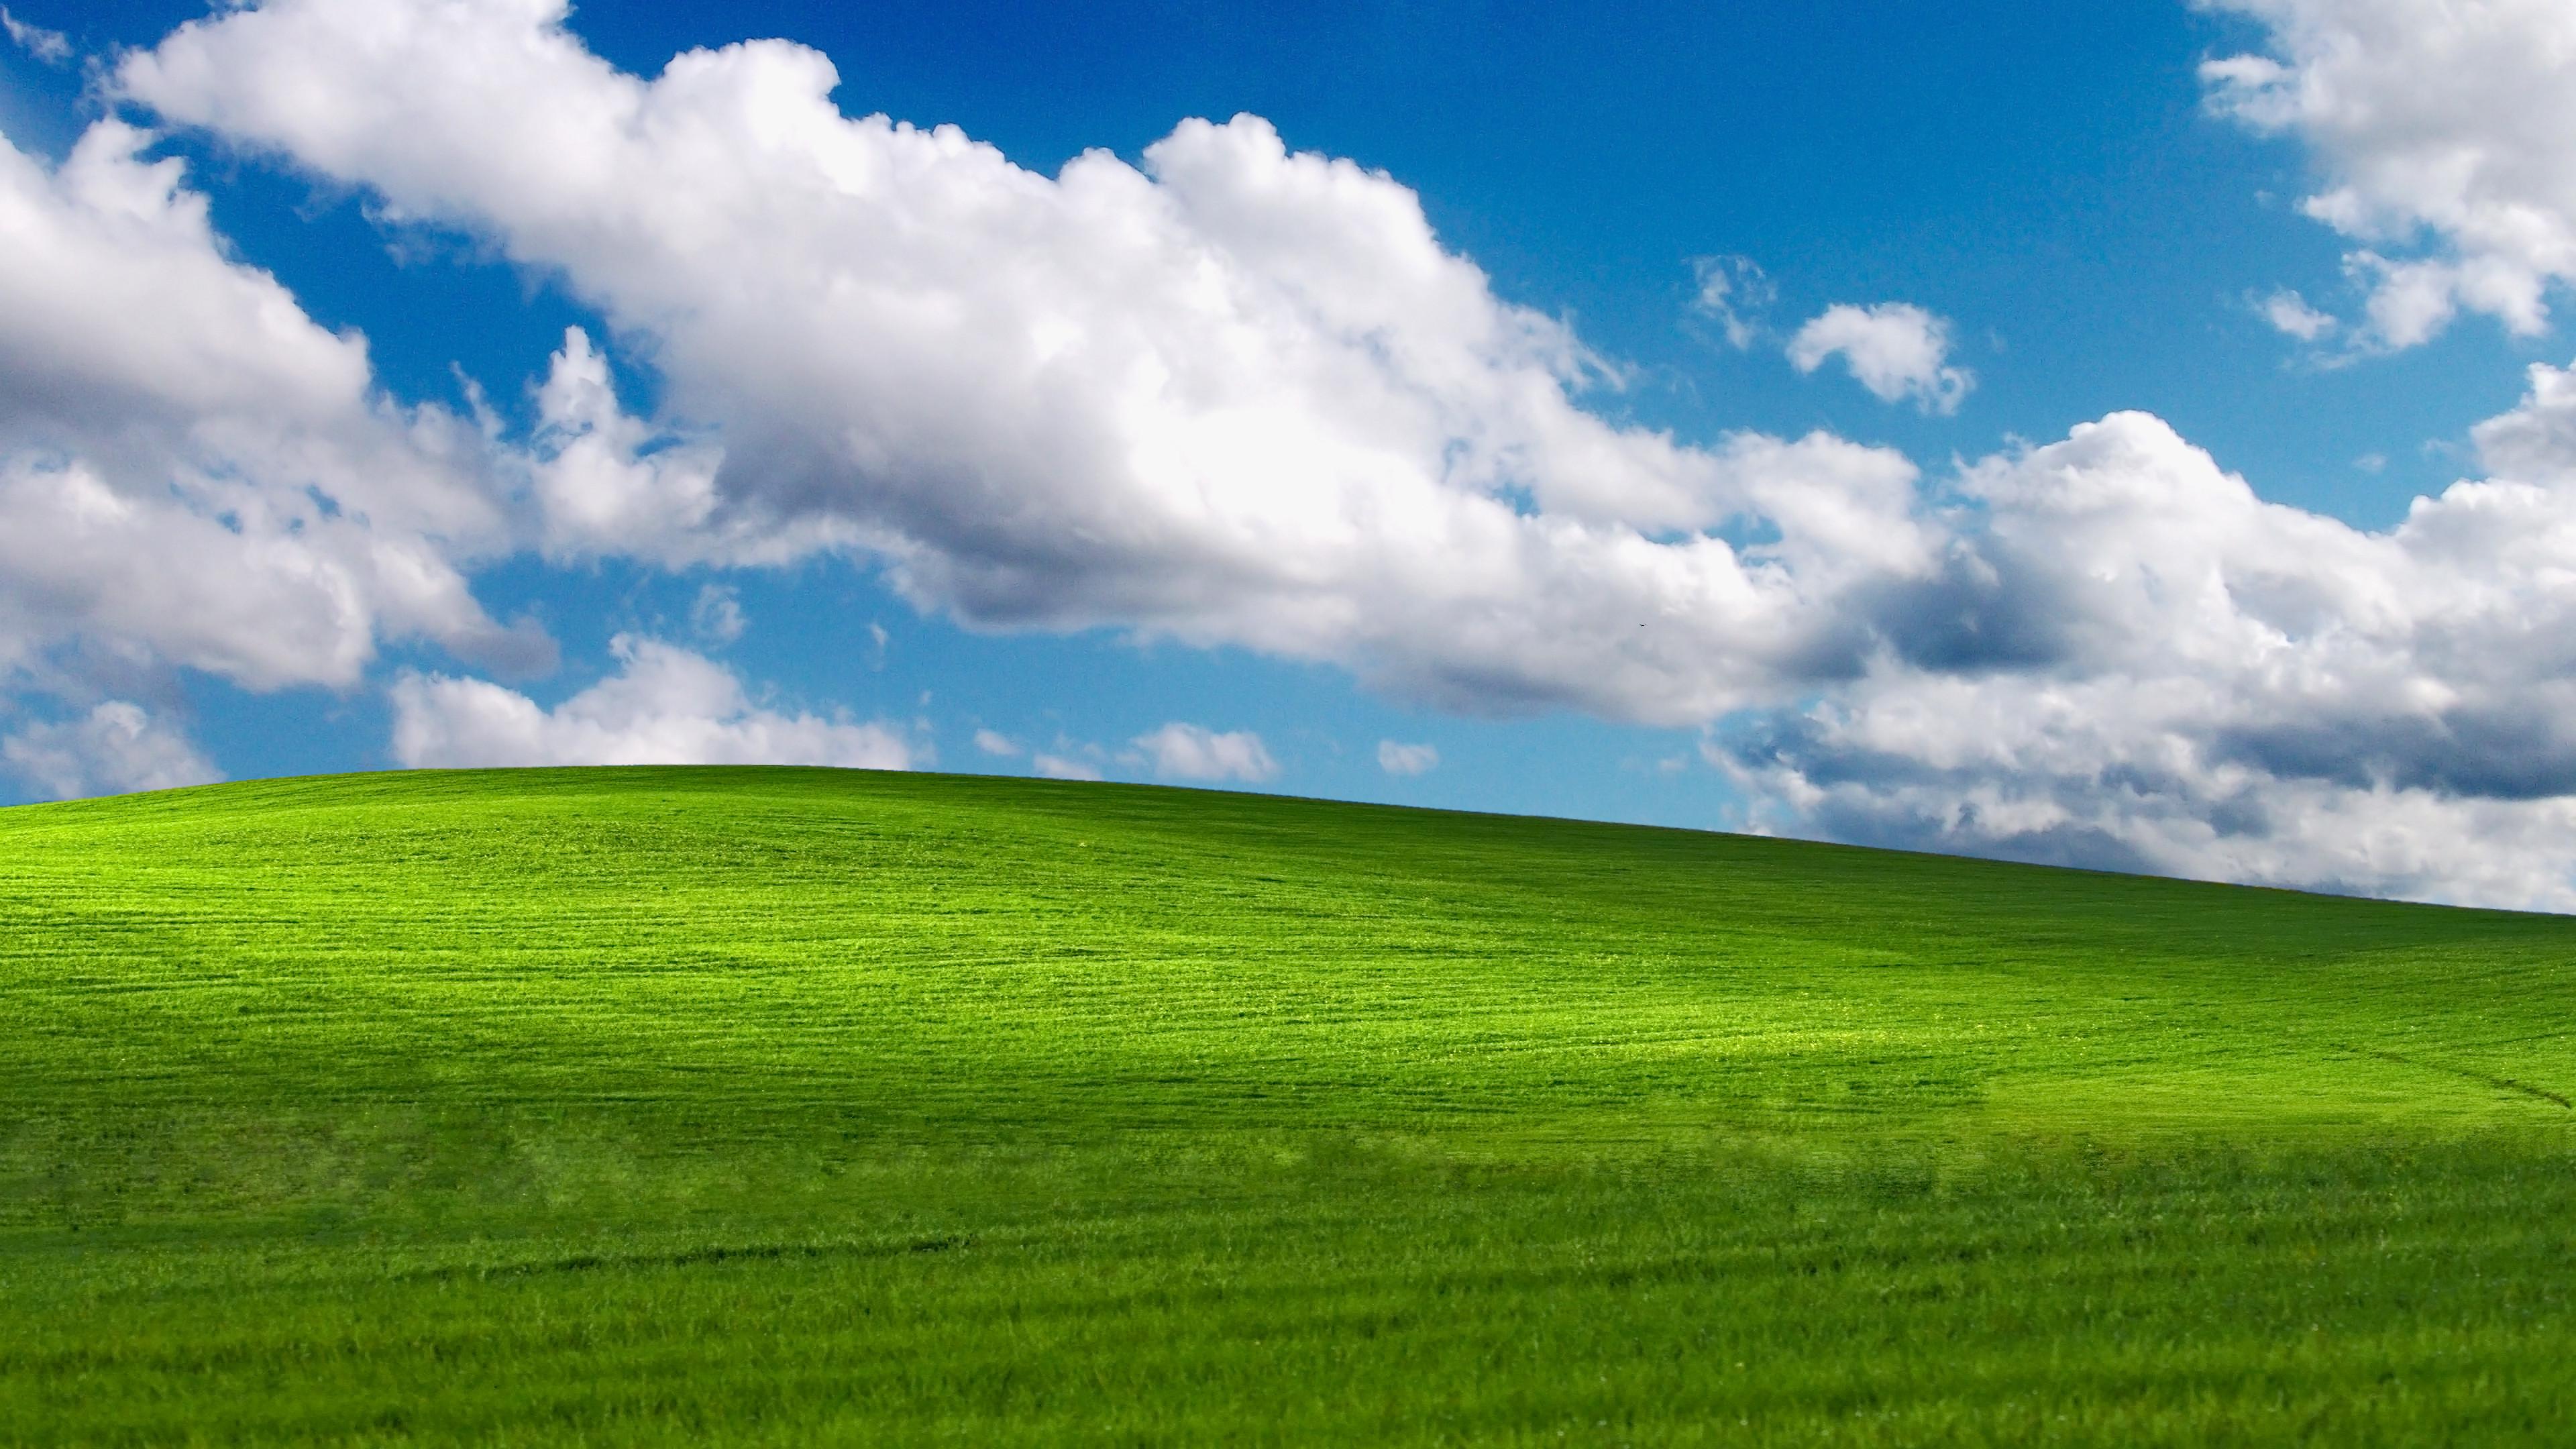 Windows xp hd wallpaper ·①.